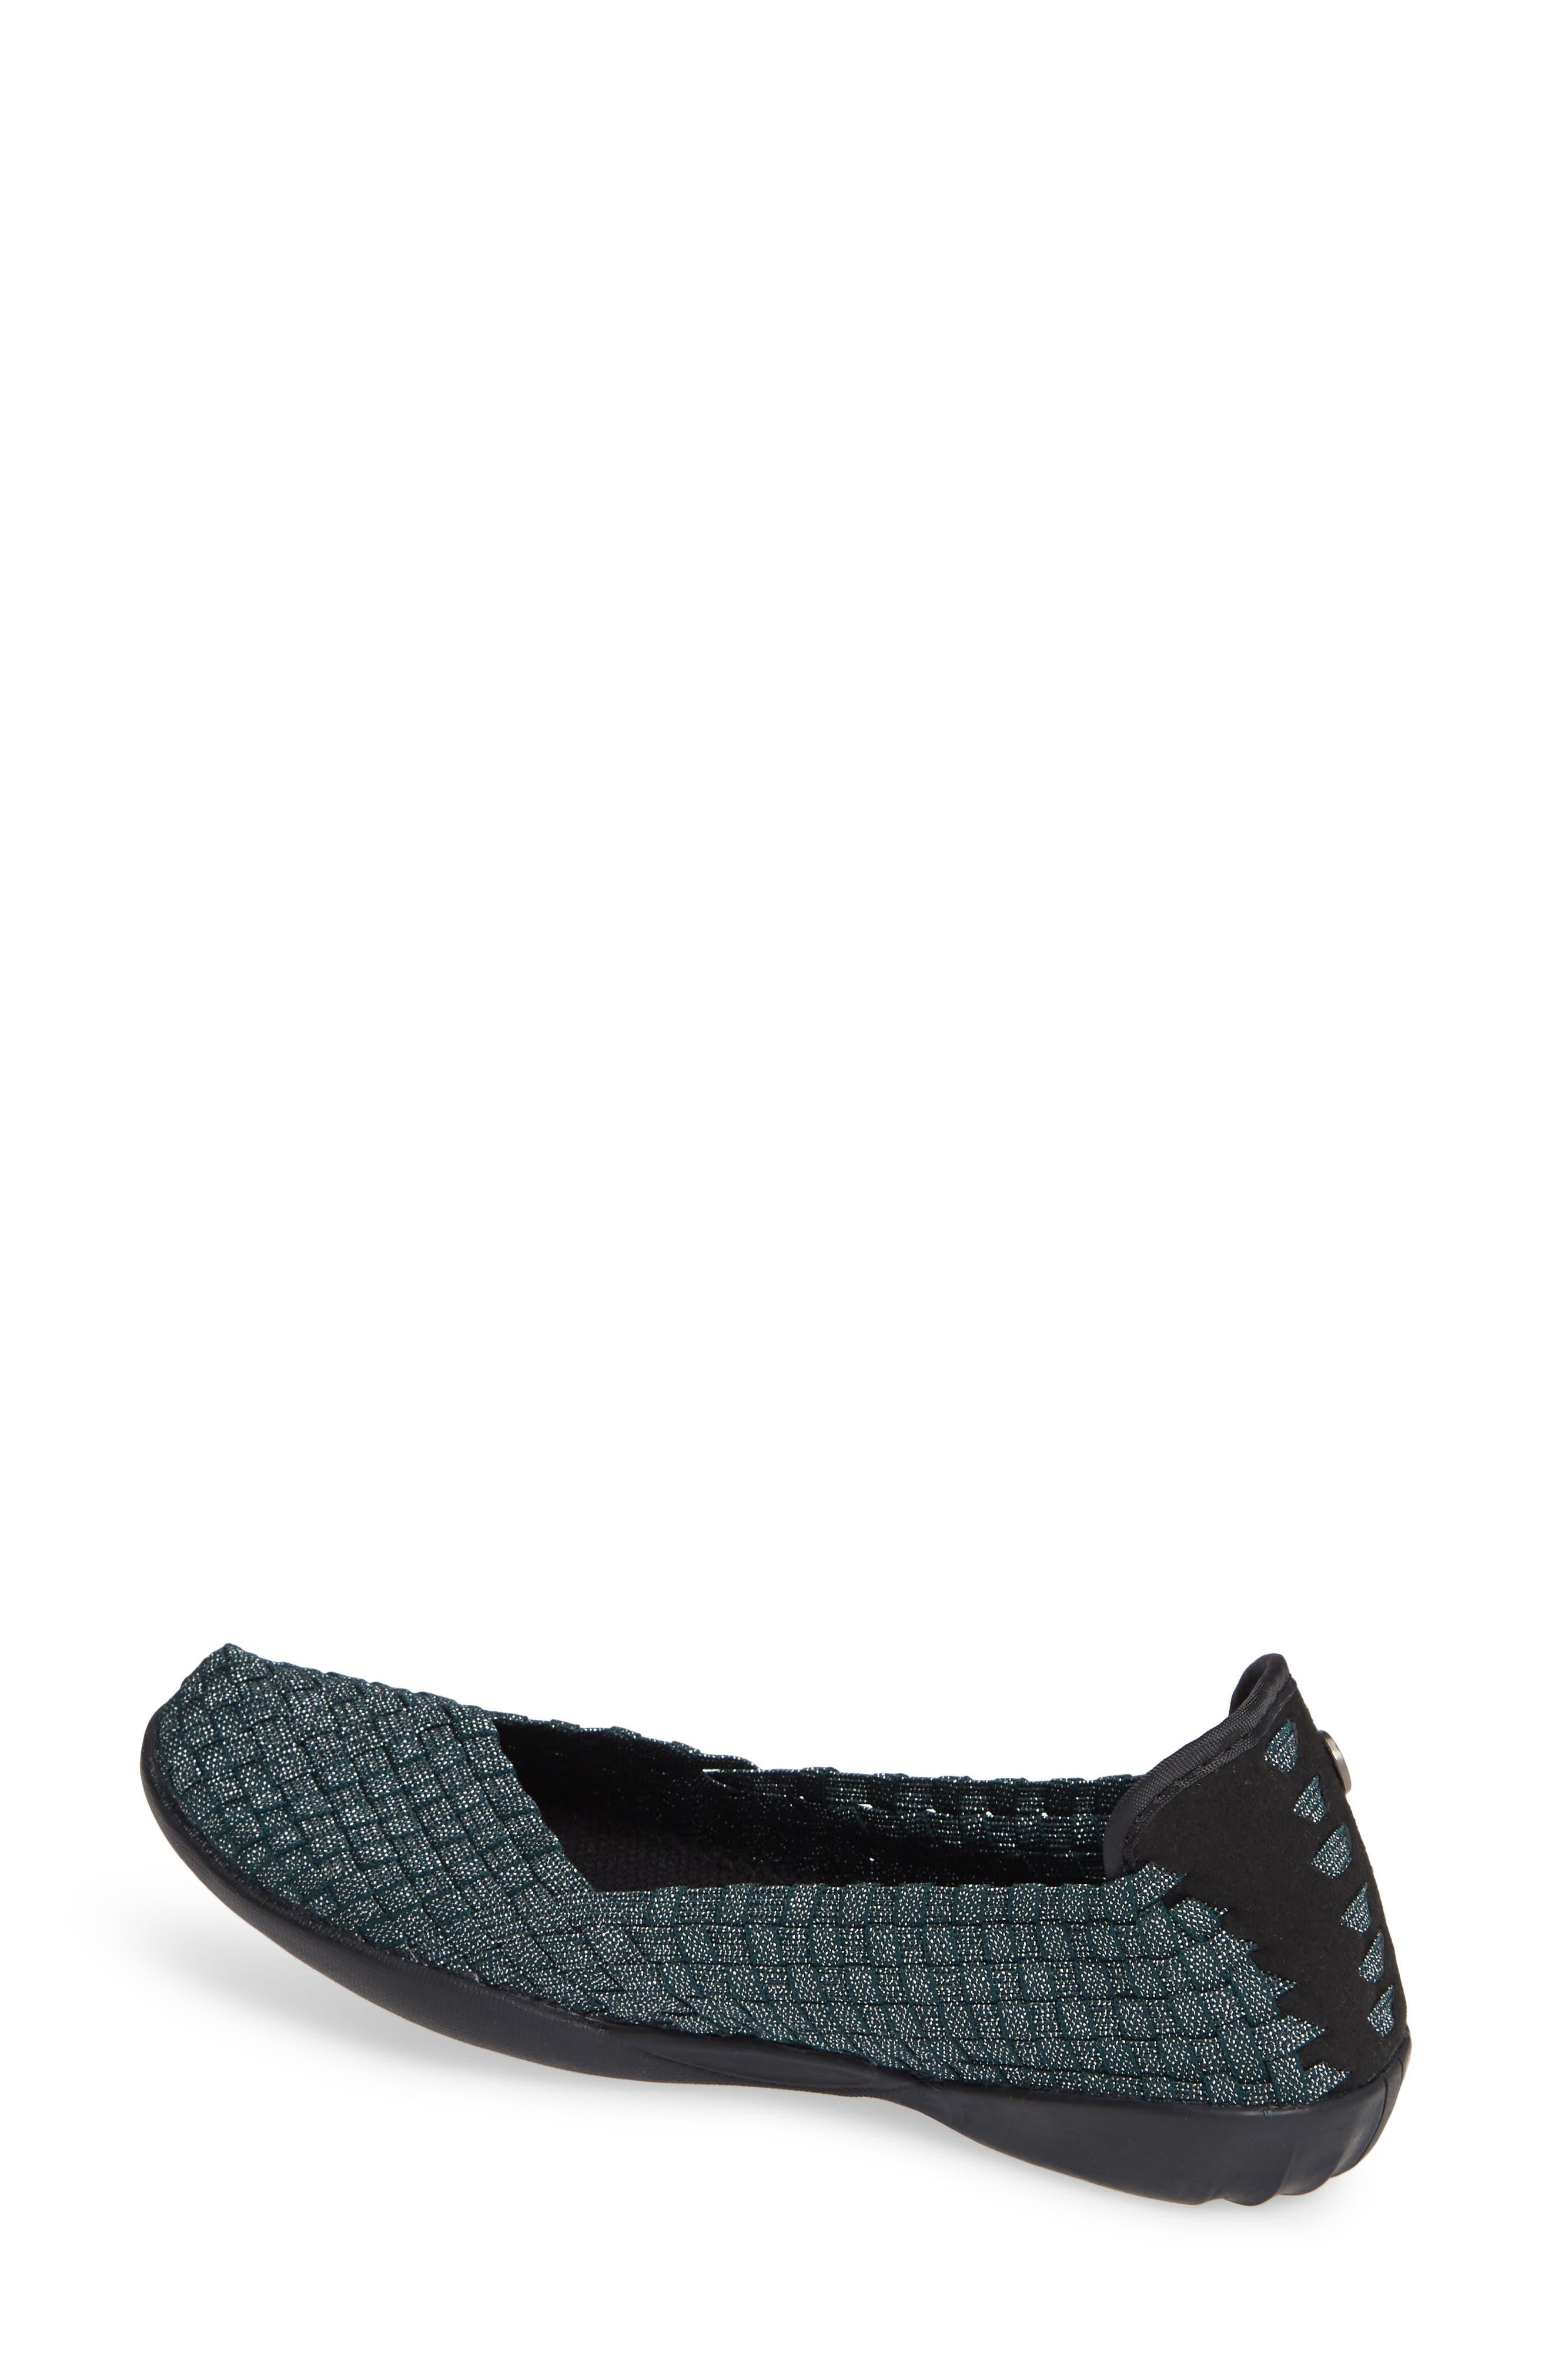 Catwalk Sneaker,                             Alternate thumbnail 2, color,                             DEEP GREEN SHIMMER FABRIC